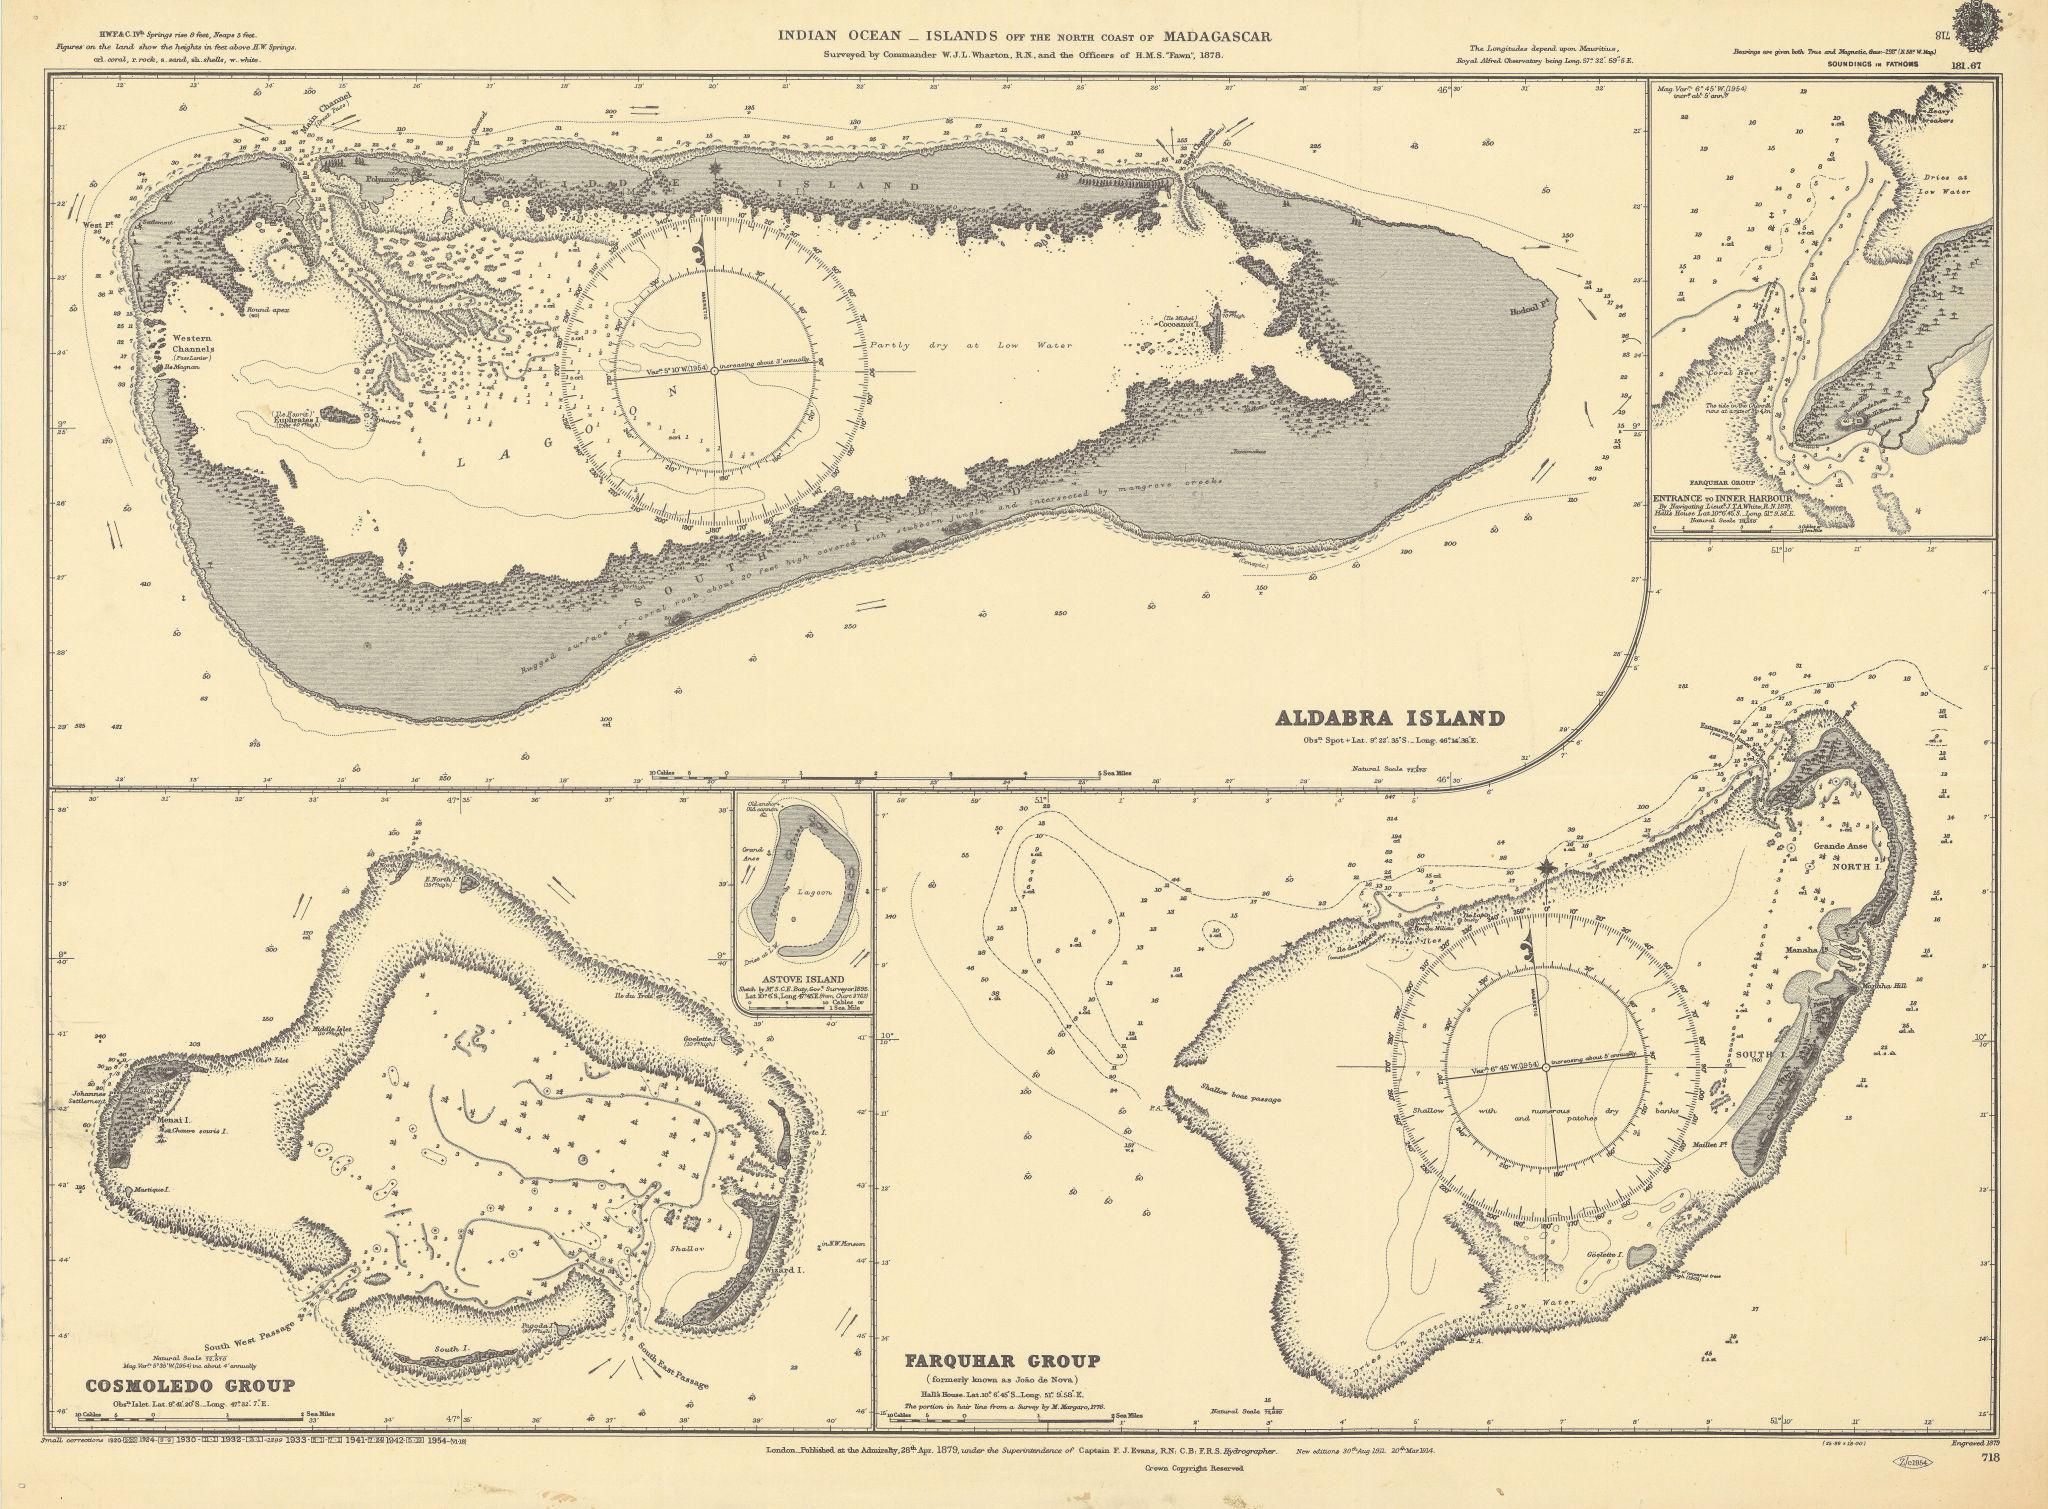 Seychelles Cosmoledo Aldabra Farquhar Atolls ADMIRALTY sea chart 1879 (1954) map